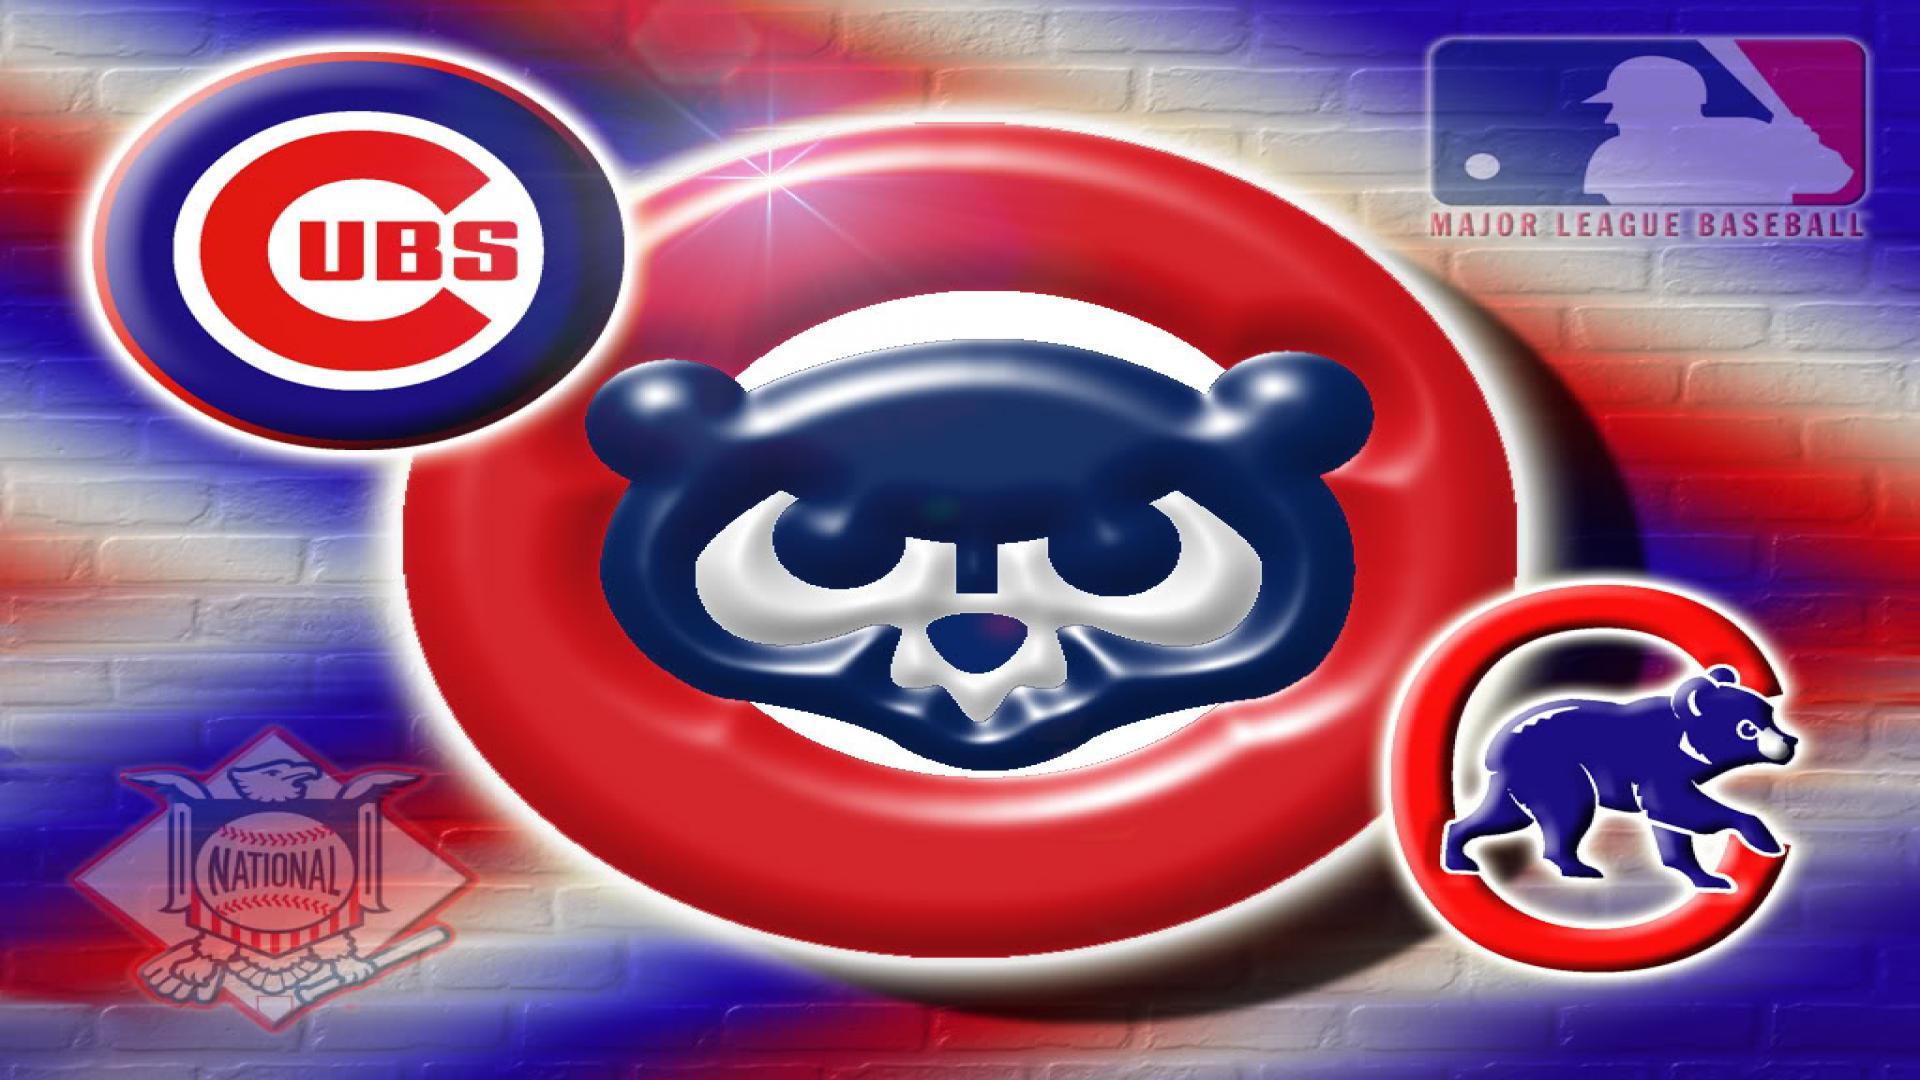 CHICAGO CUBS mlb baseball 16 wallpaper 1920x1080 232522 1920x1080